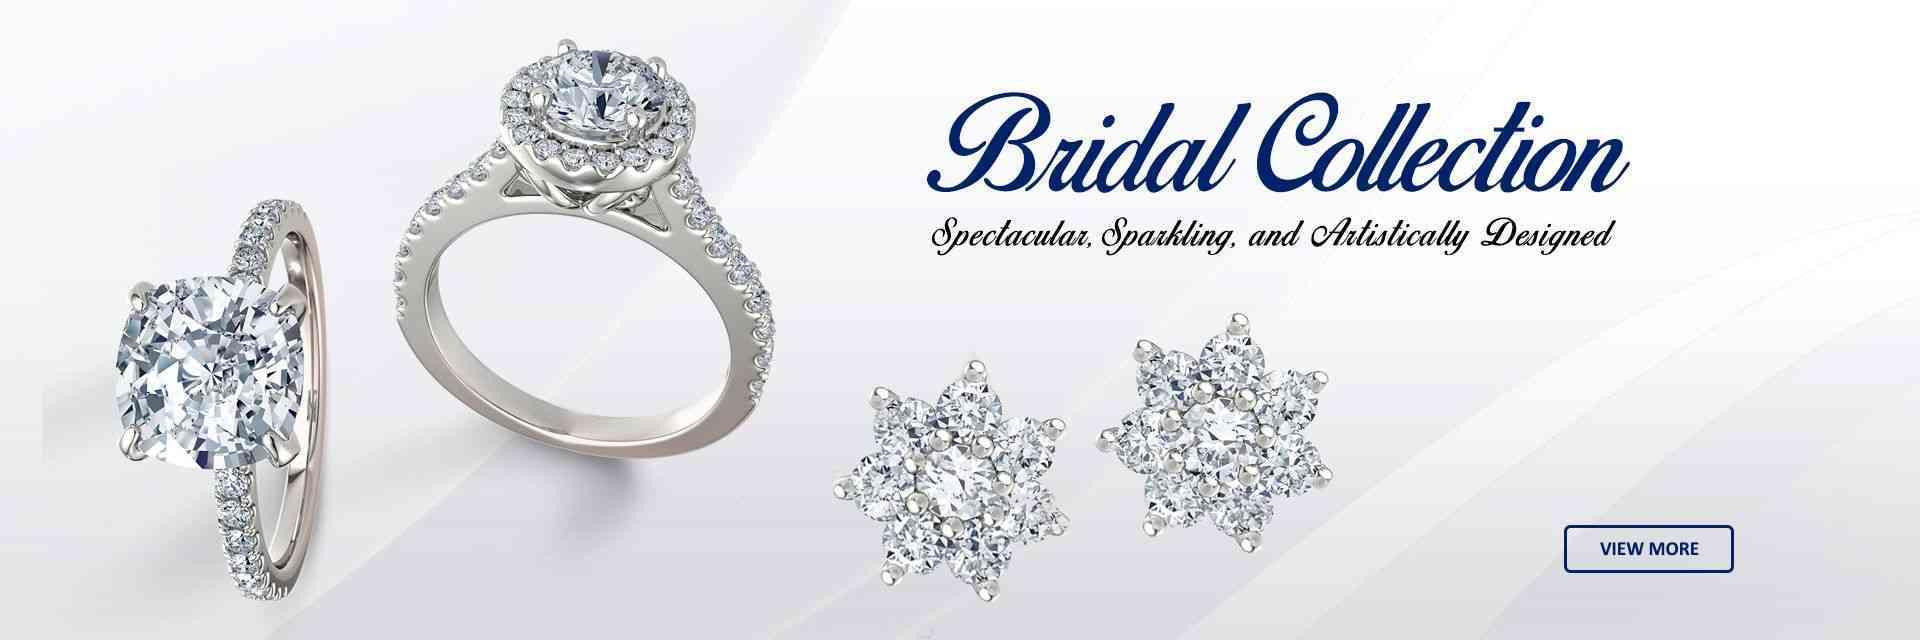 https://www.jewelrynest.com/designer-diamond-gemstone-rings/exclusive-diamond-engagement-rings/diamonds-only.html